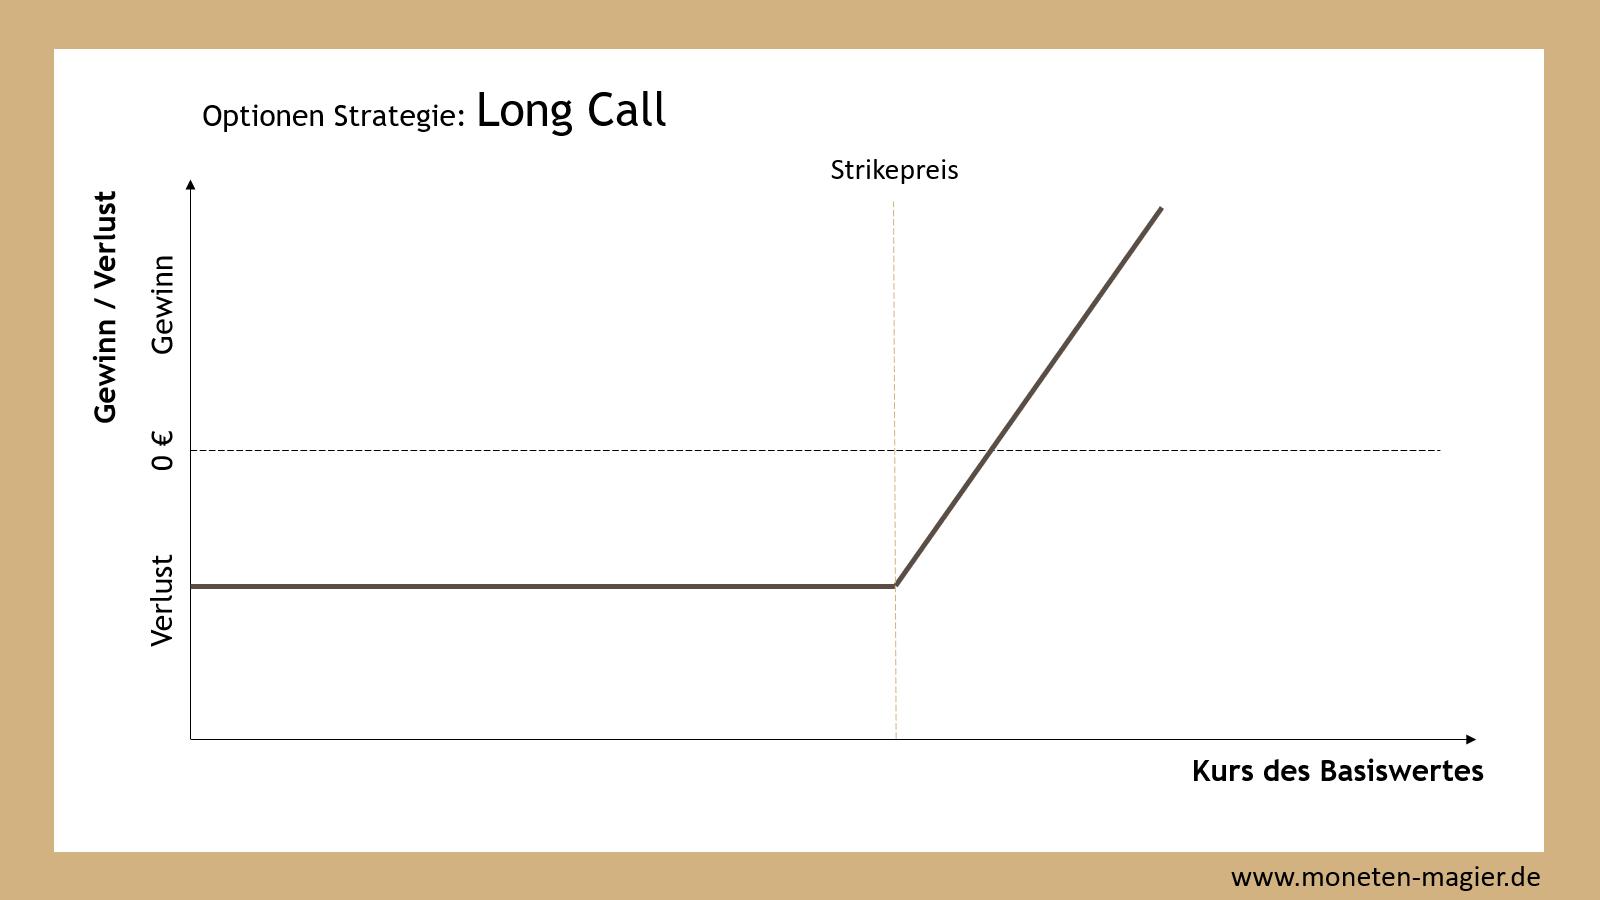 long call optionen strategie moneten magier